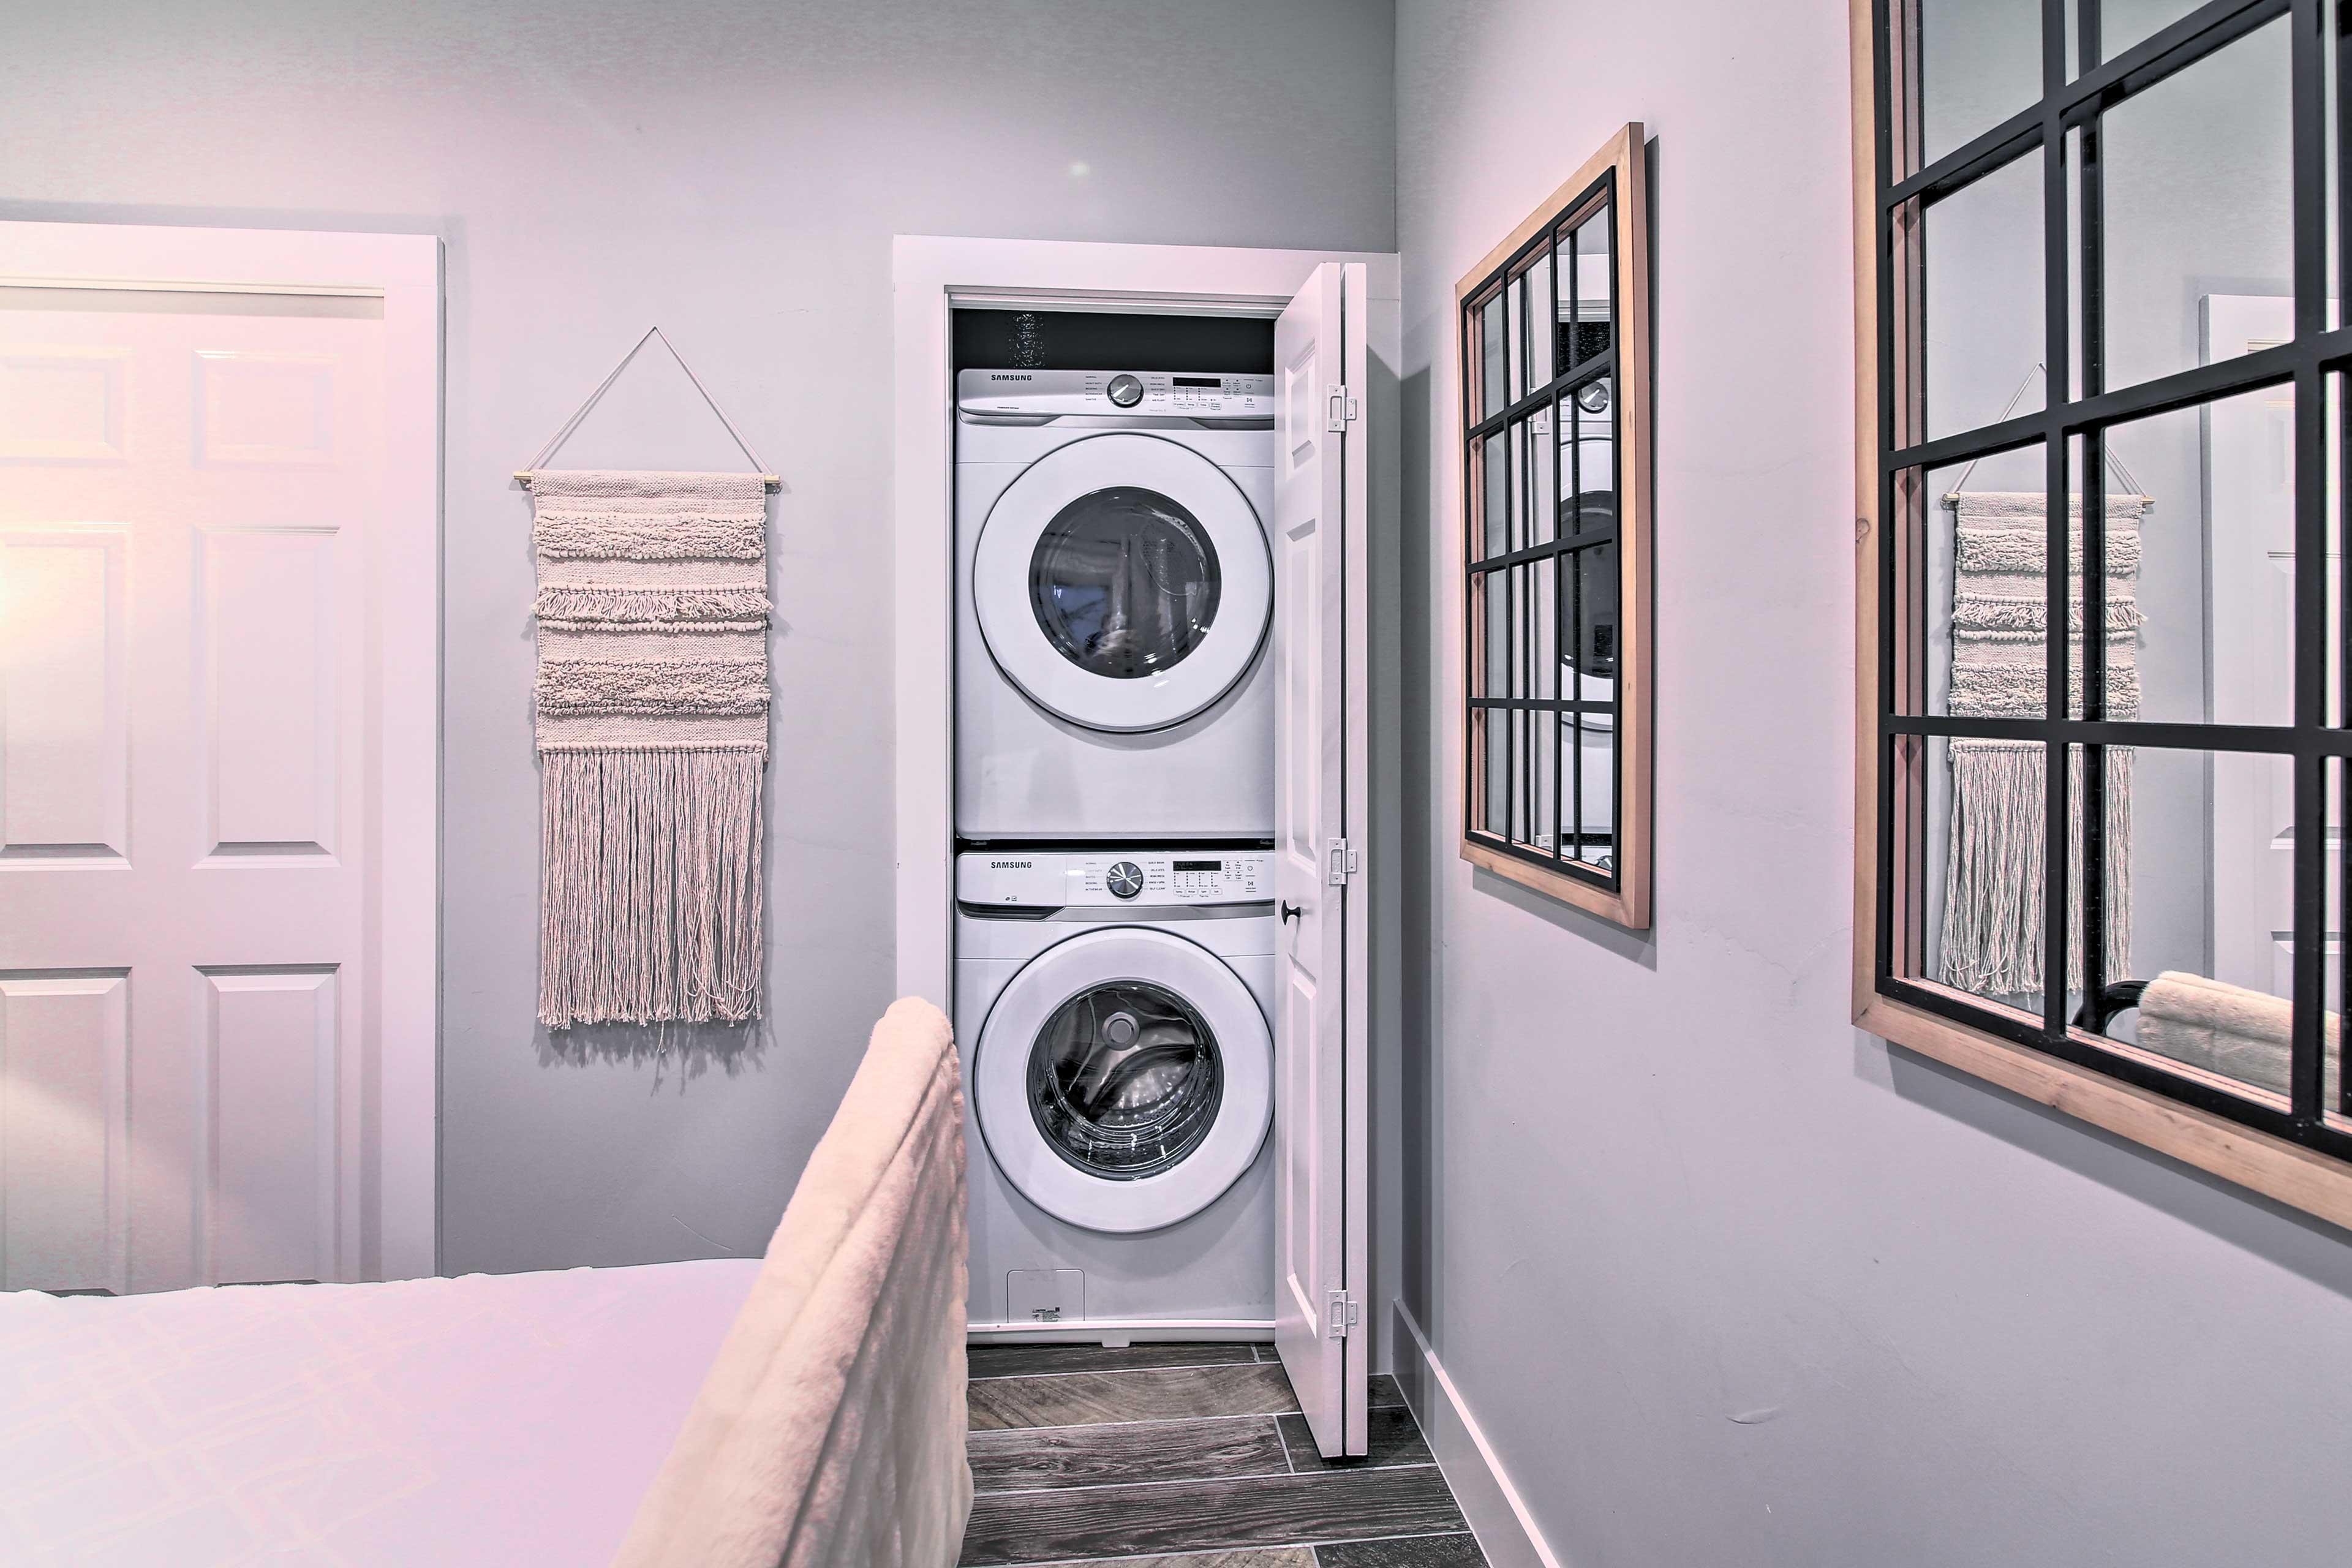 Bedroom | In-Unit Laundry Machines